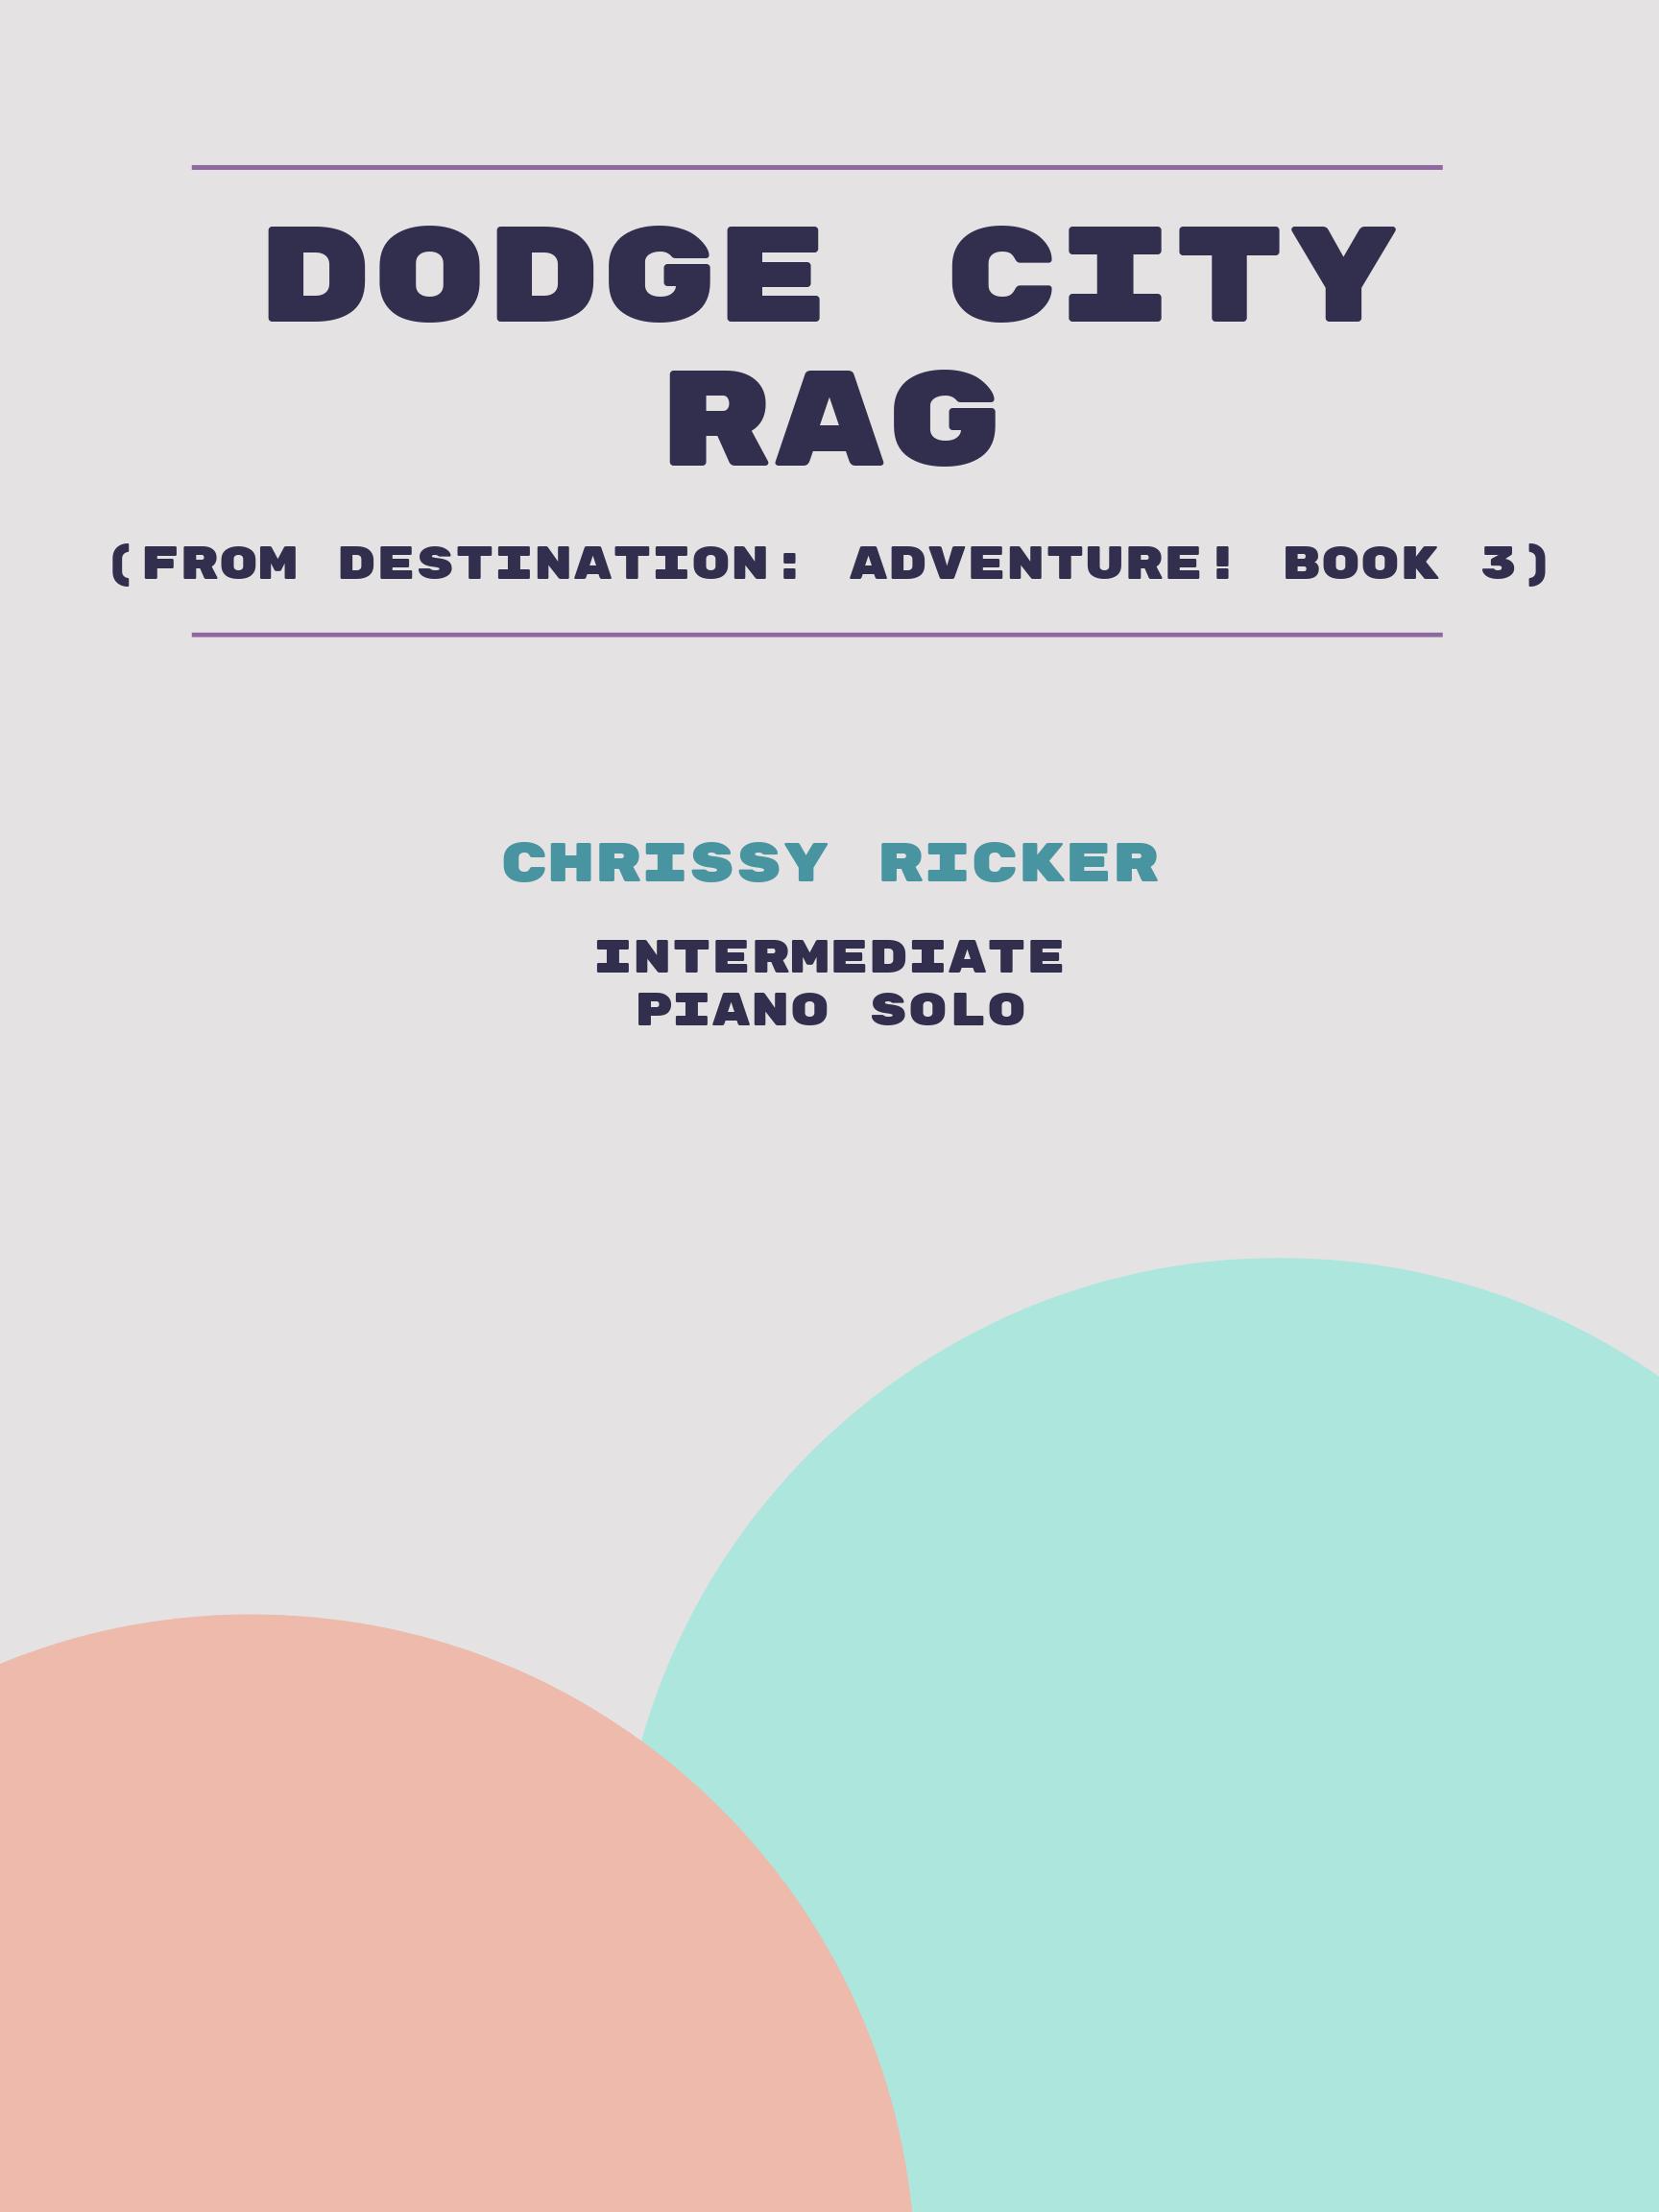 Dodge City Rag by Chrissy Ricker